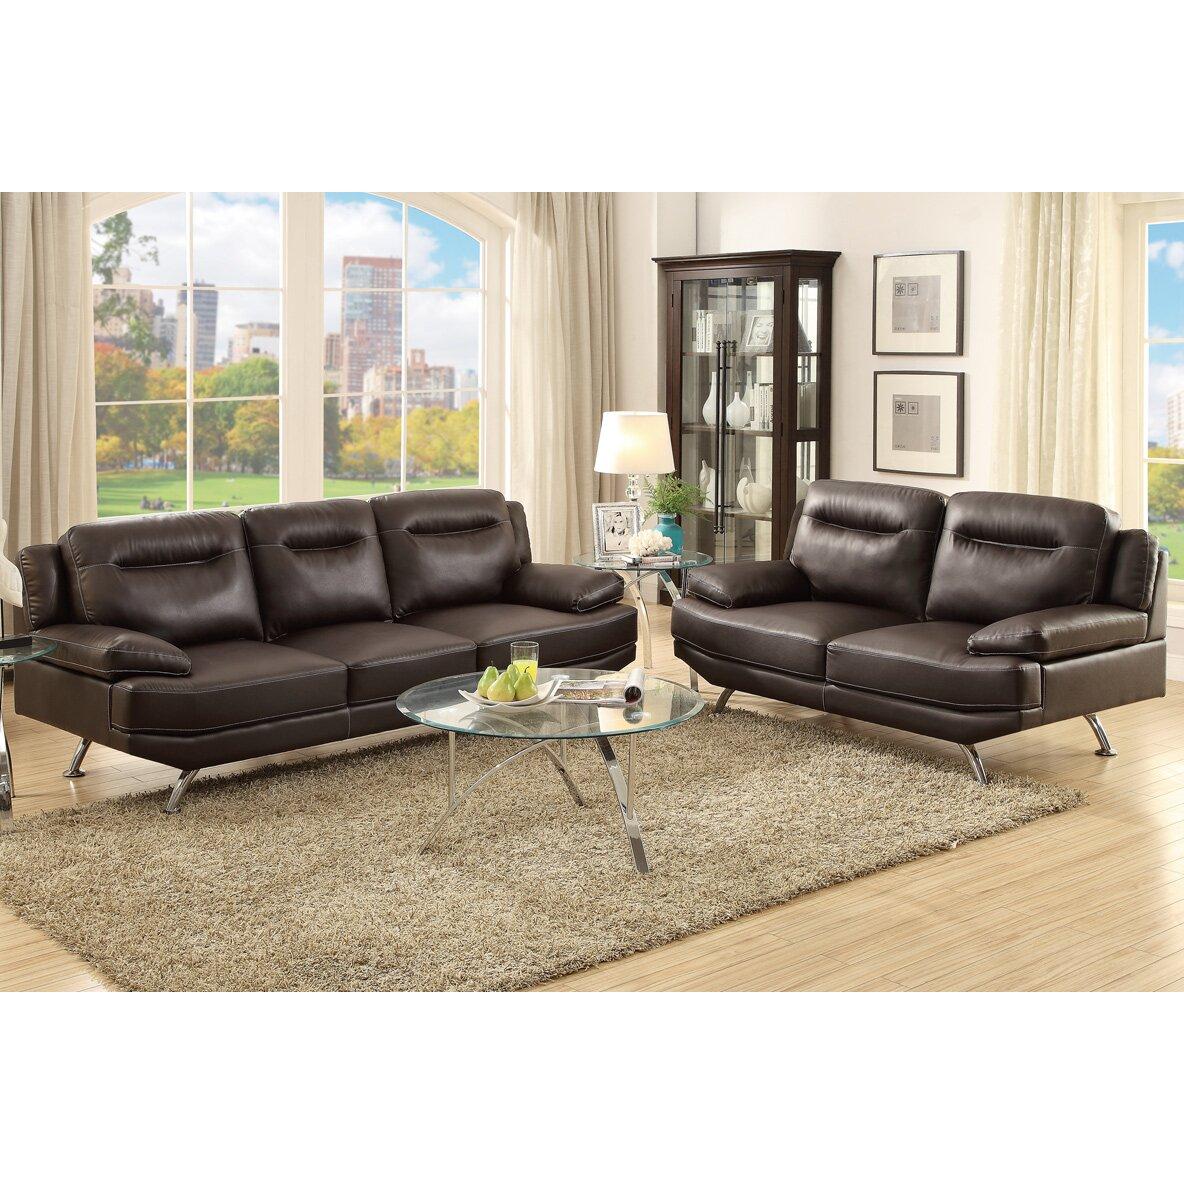 Poundex bobkona danville 2 piece sofa and loveseat set for 2 piece sofa set